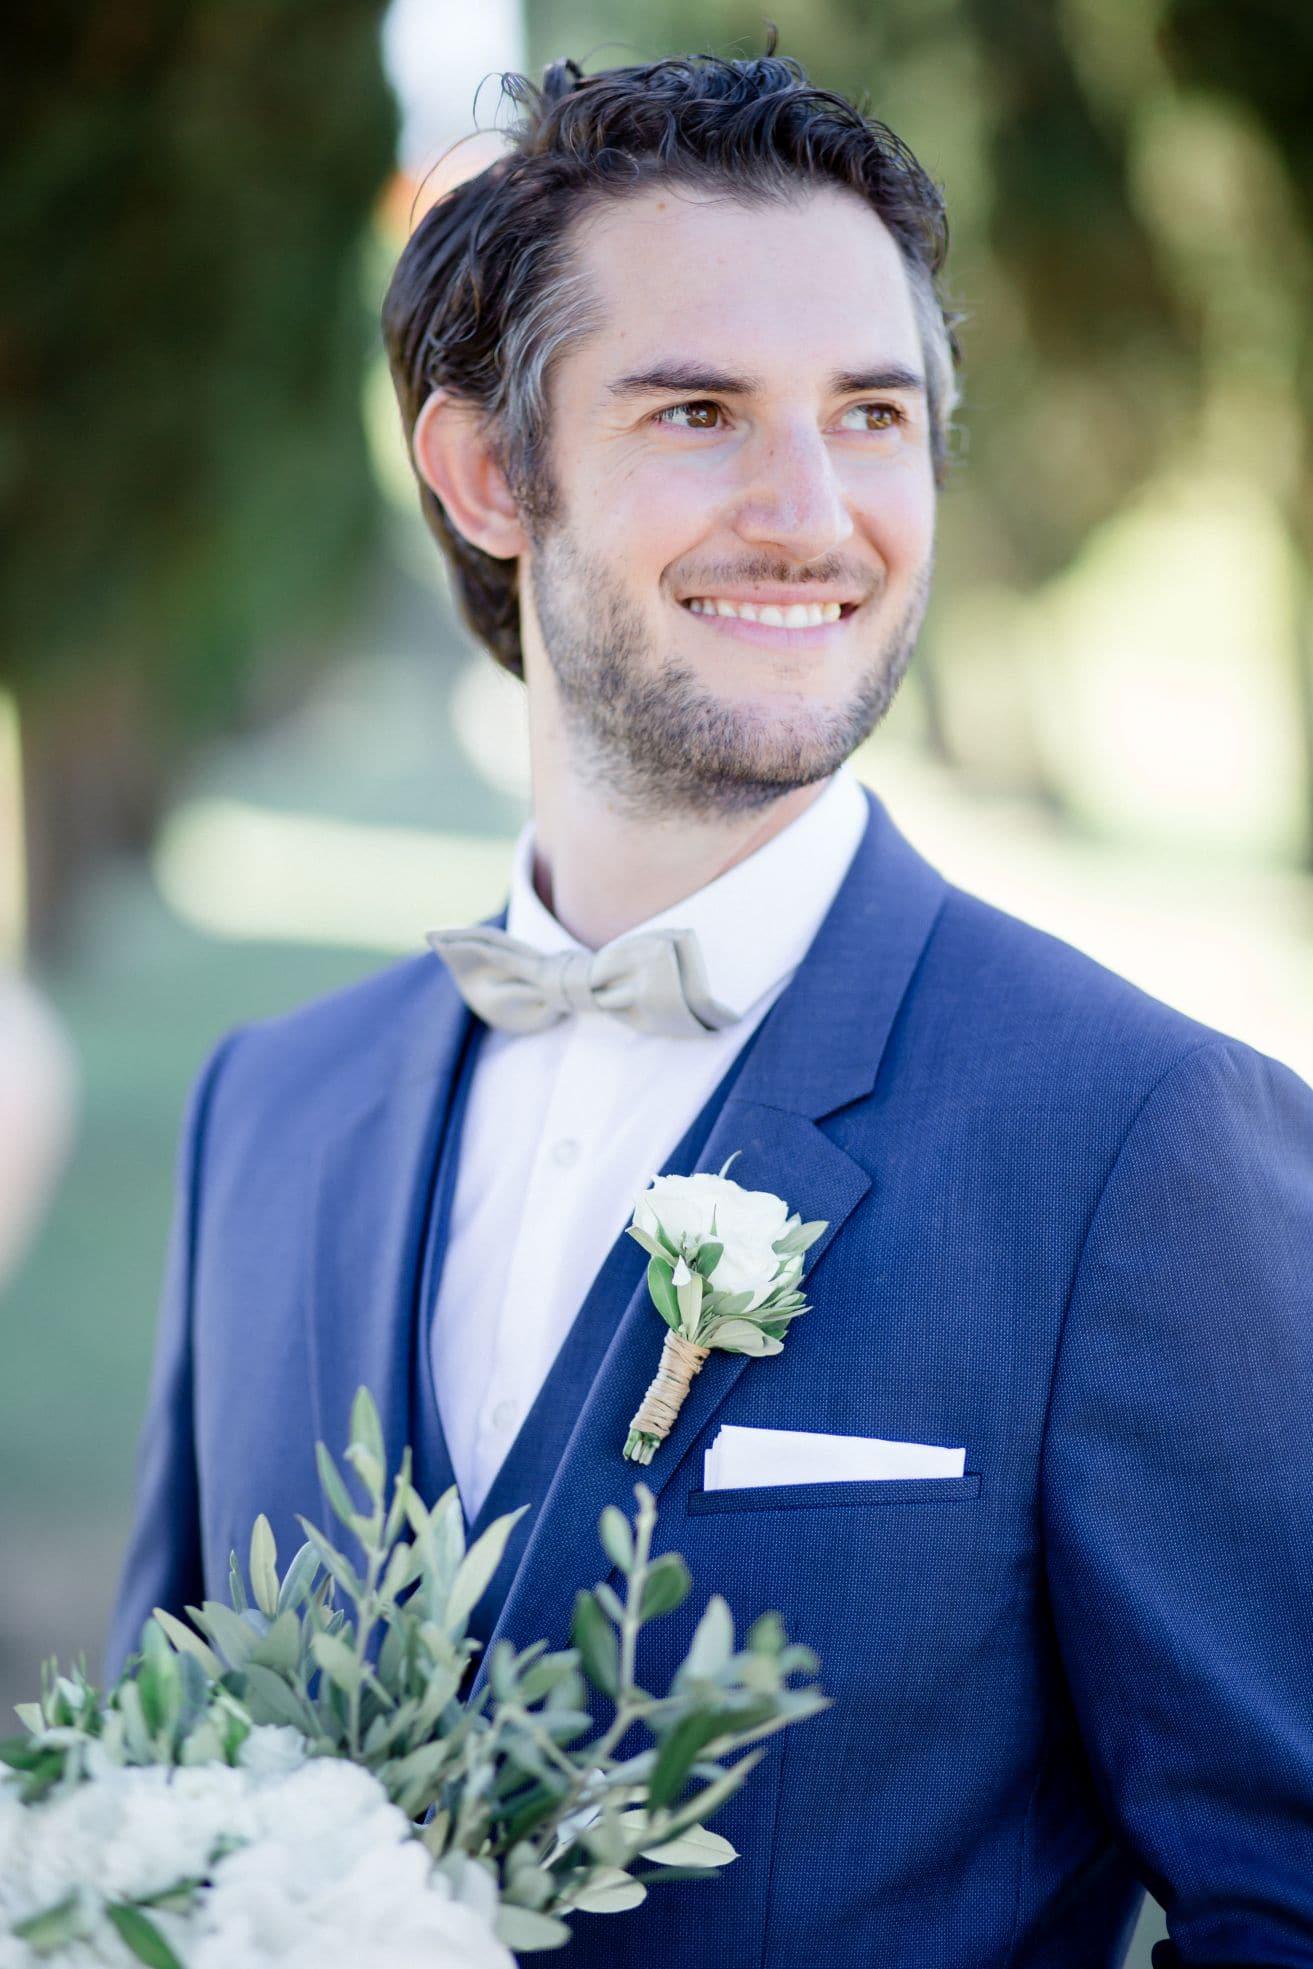 Million Memories_A&D_Hochzeitsfotograf_Schlosshochzeit_Toskana_Lago Di Como_Wedding_Tuscany_103